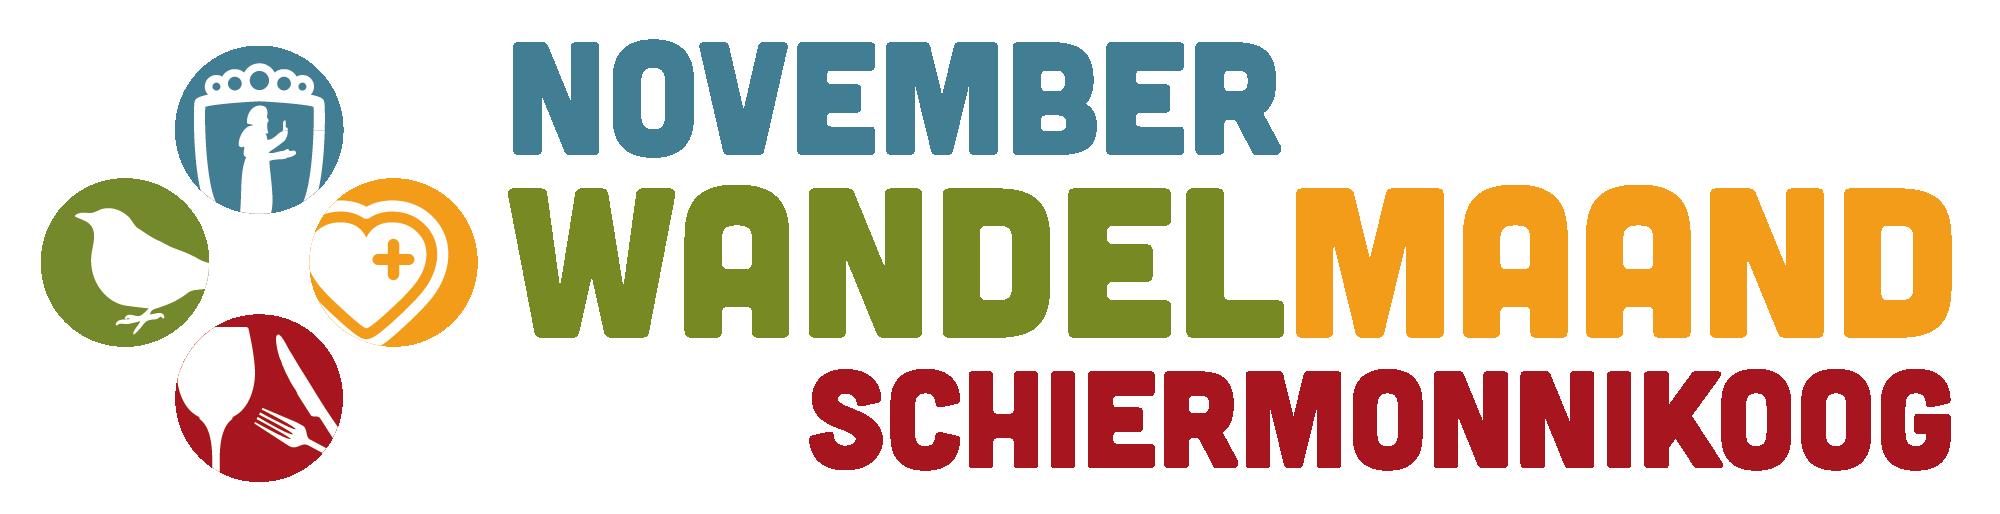 November Wandelmaand Schiermonnikoog